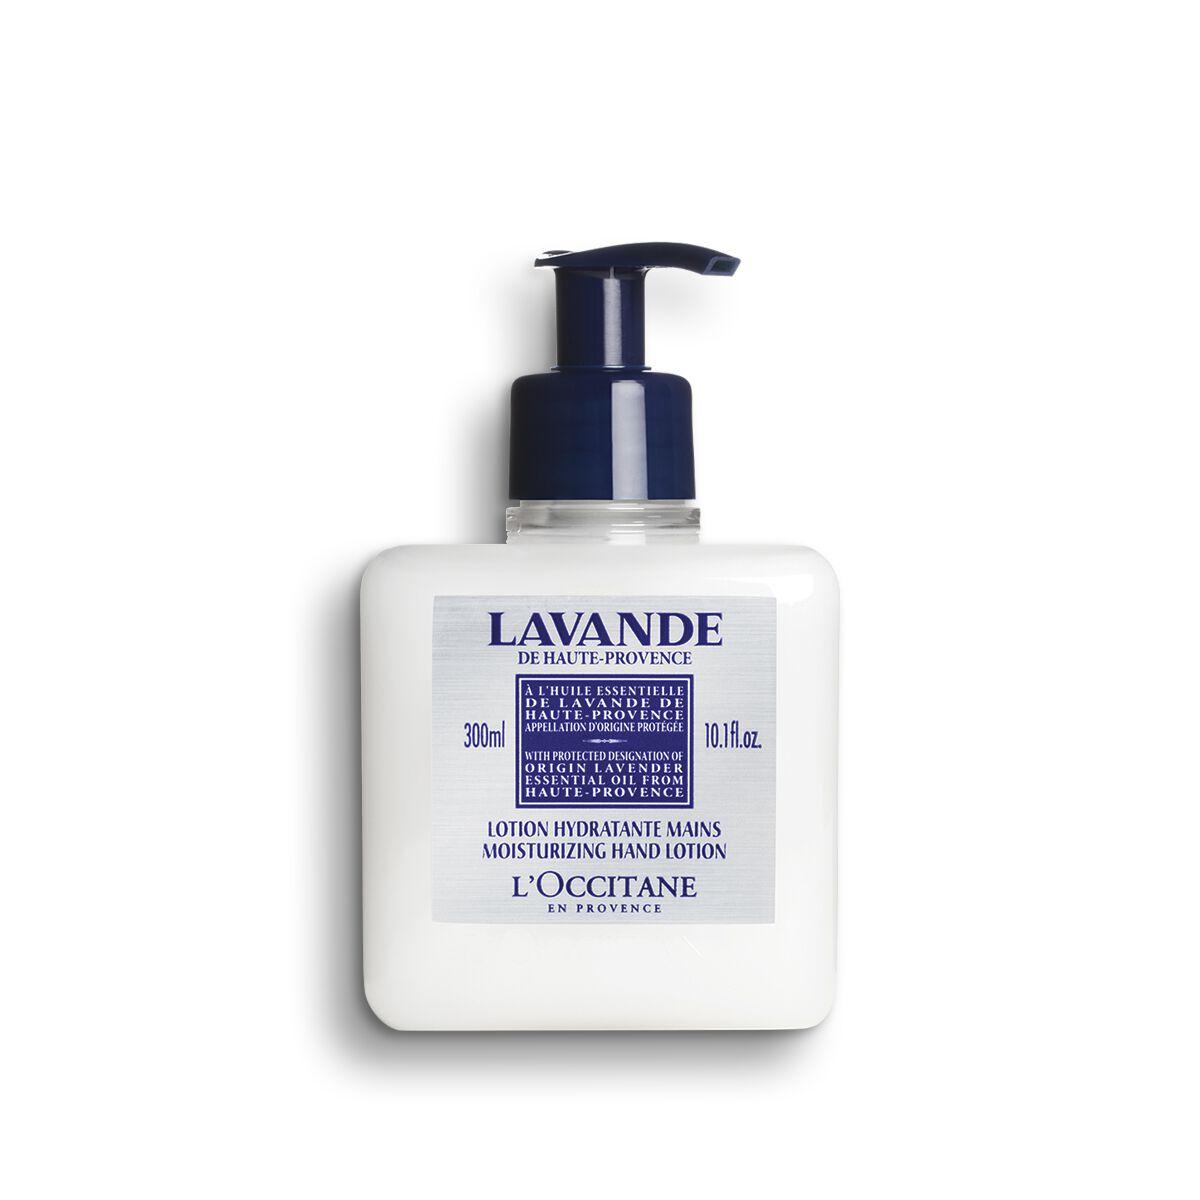 Lavender Moisturizing Hand Lotion 300 ml. - L'OCCITANE